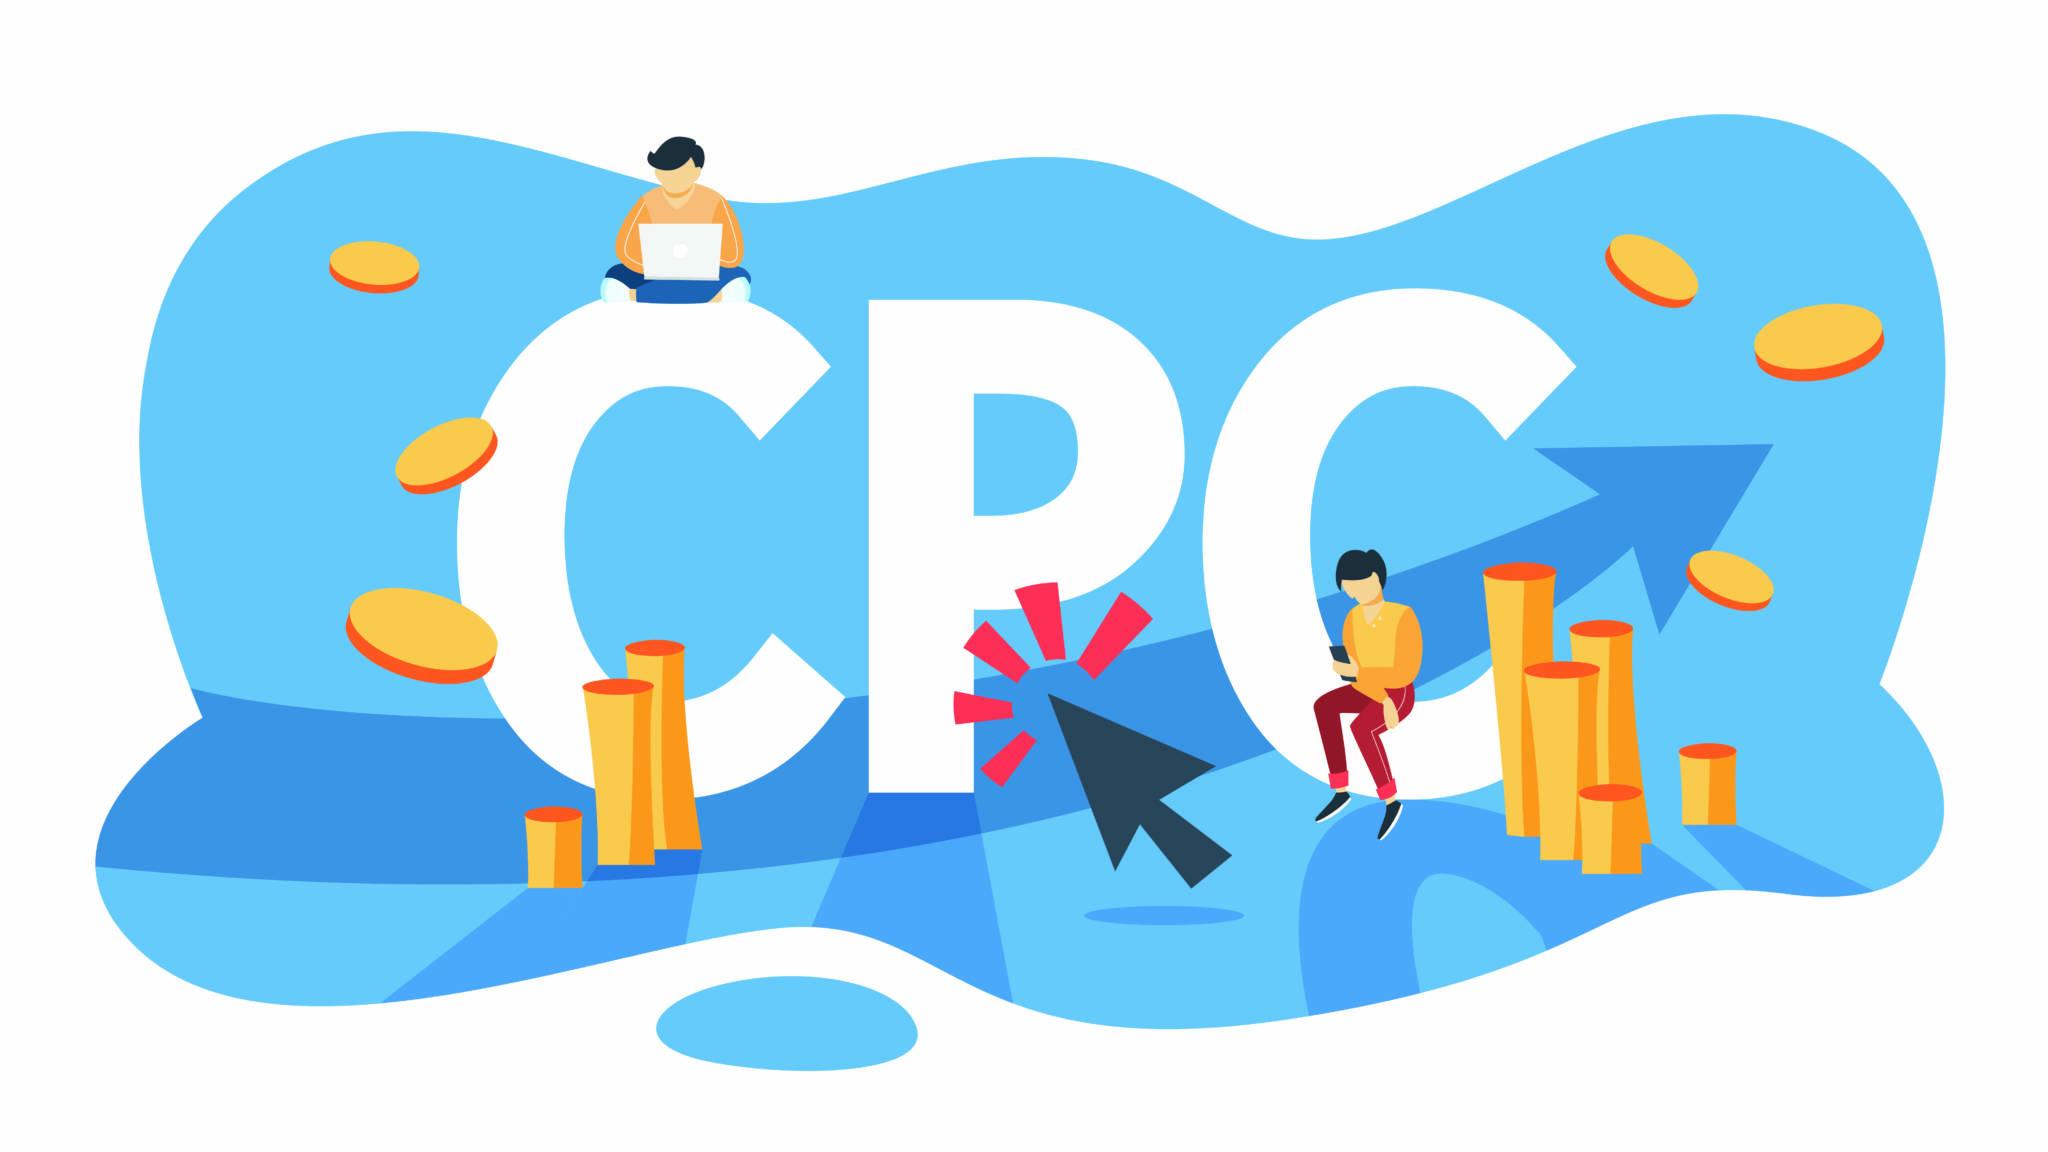 kampania CPC